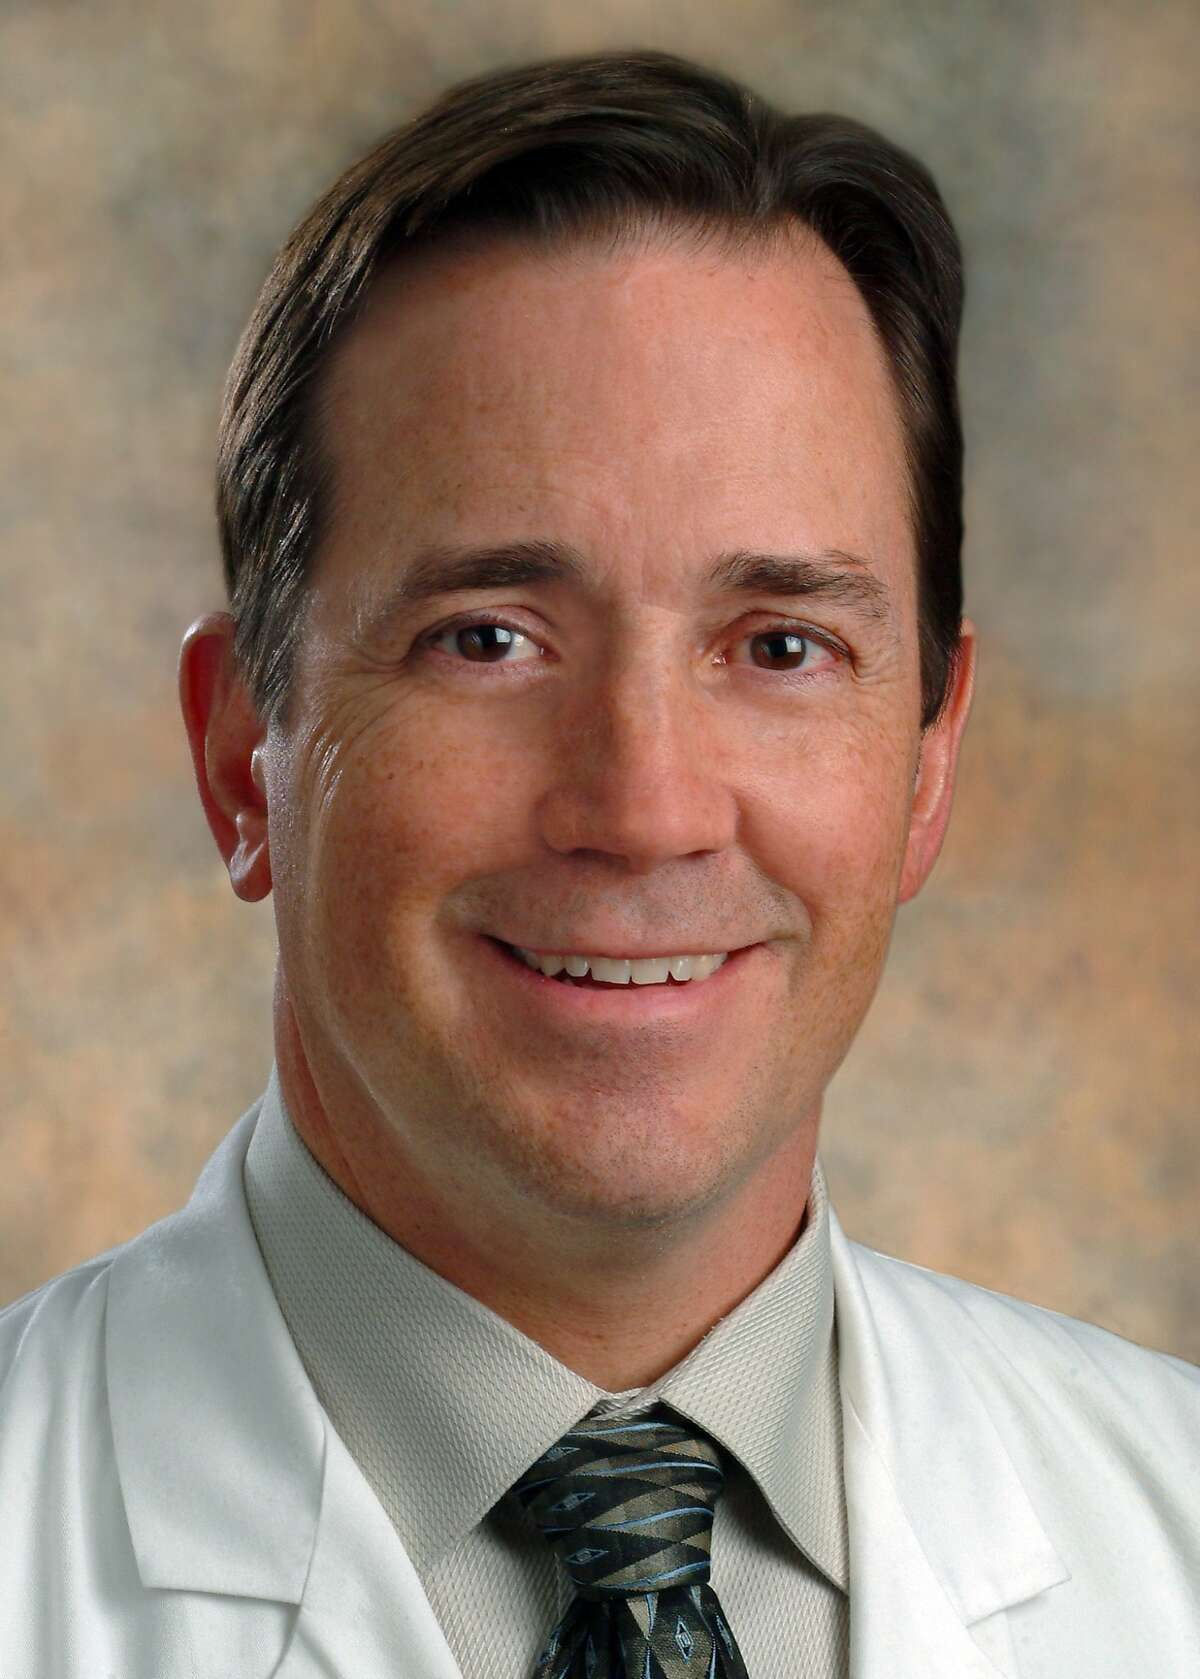 Gregg Jossart, director of minimally invasive surgery at California Pacific Medical Center